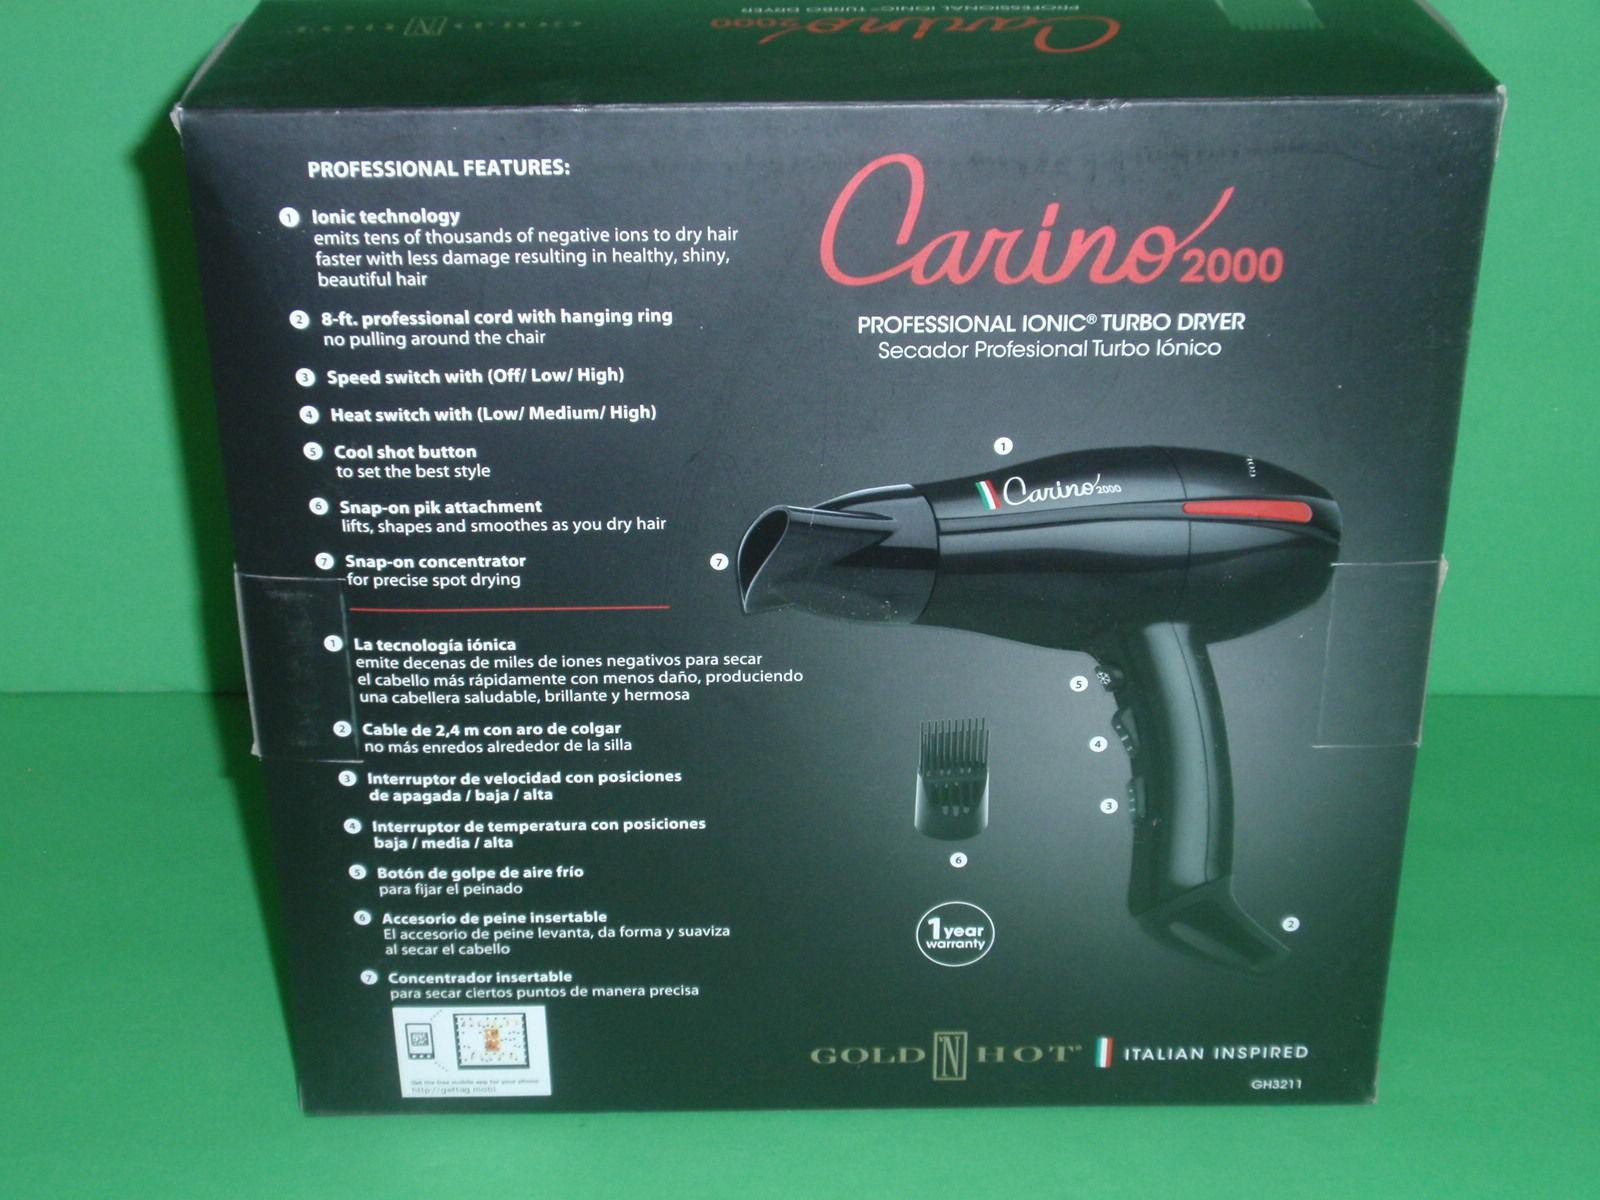 CARINO 2000  PROFESSIONAL IONIC TURBO HAIR DRYER